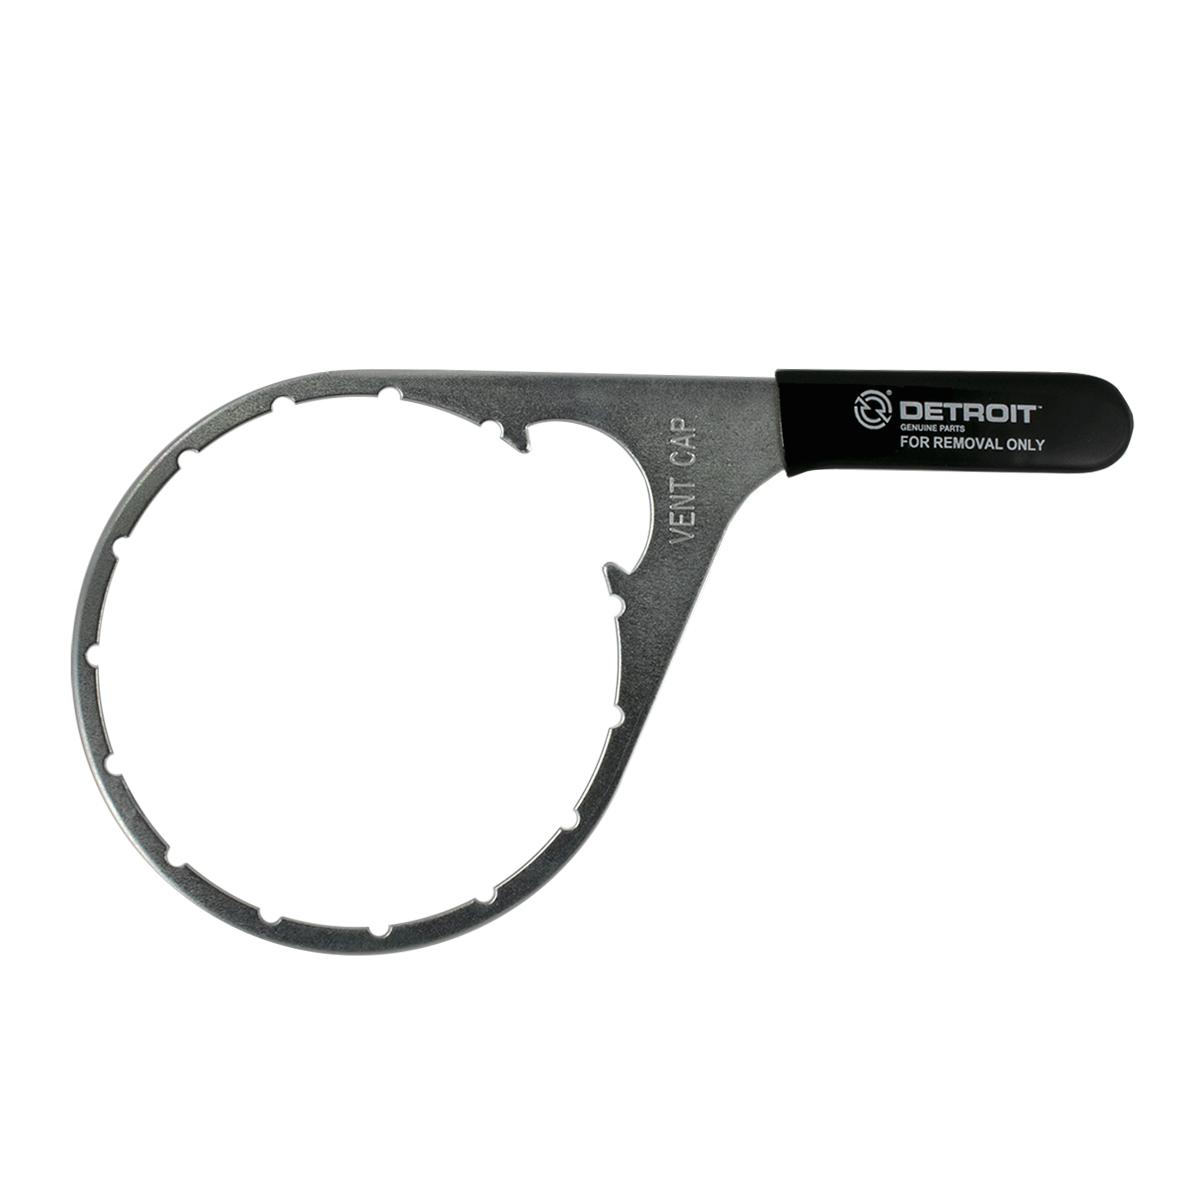 Davco Fuel Filter Wrench Set Wiring Diagrams 380134dav Metal Collar 19